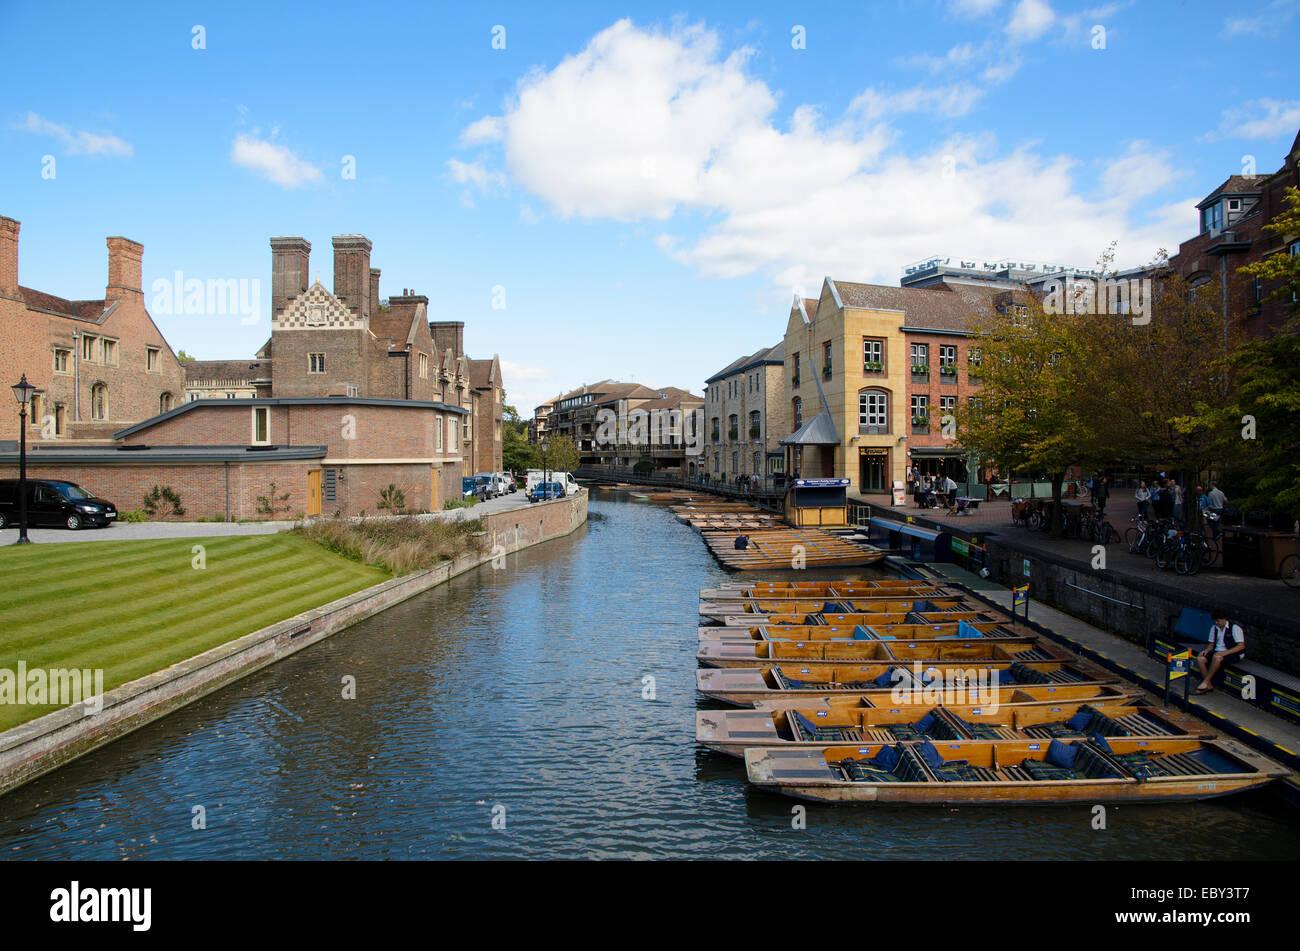 Plates onn la rivière Ram - Cambridge, Angleterre Photo Stock